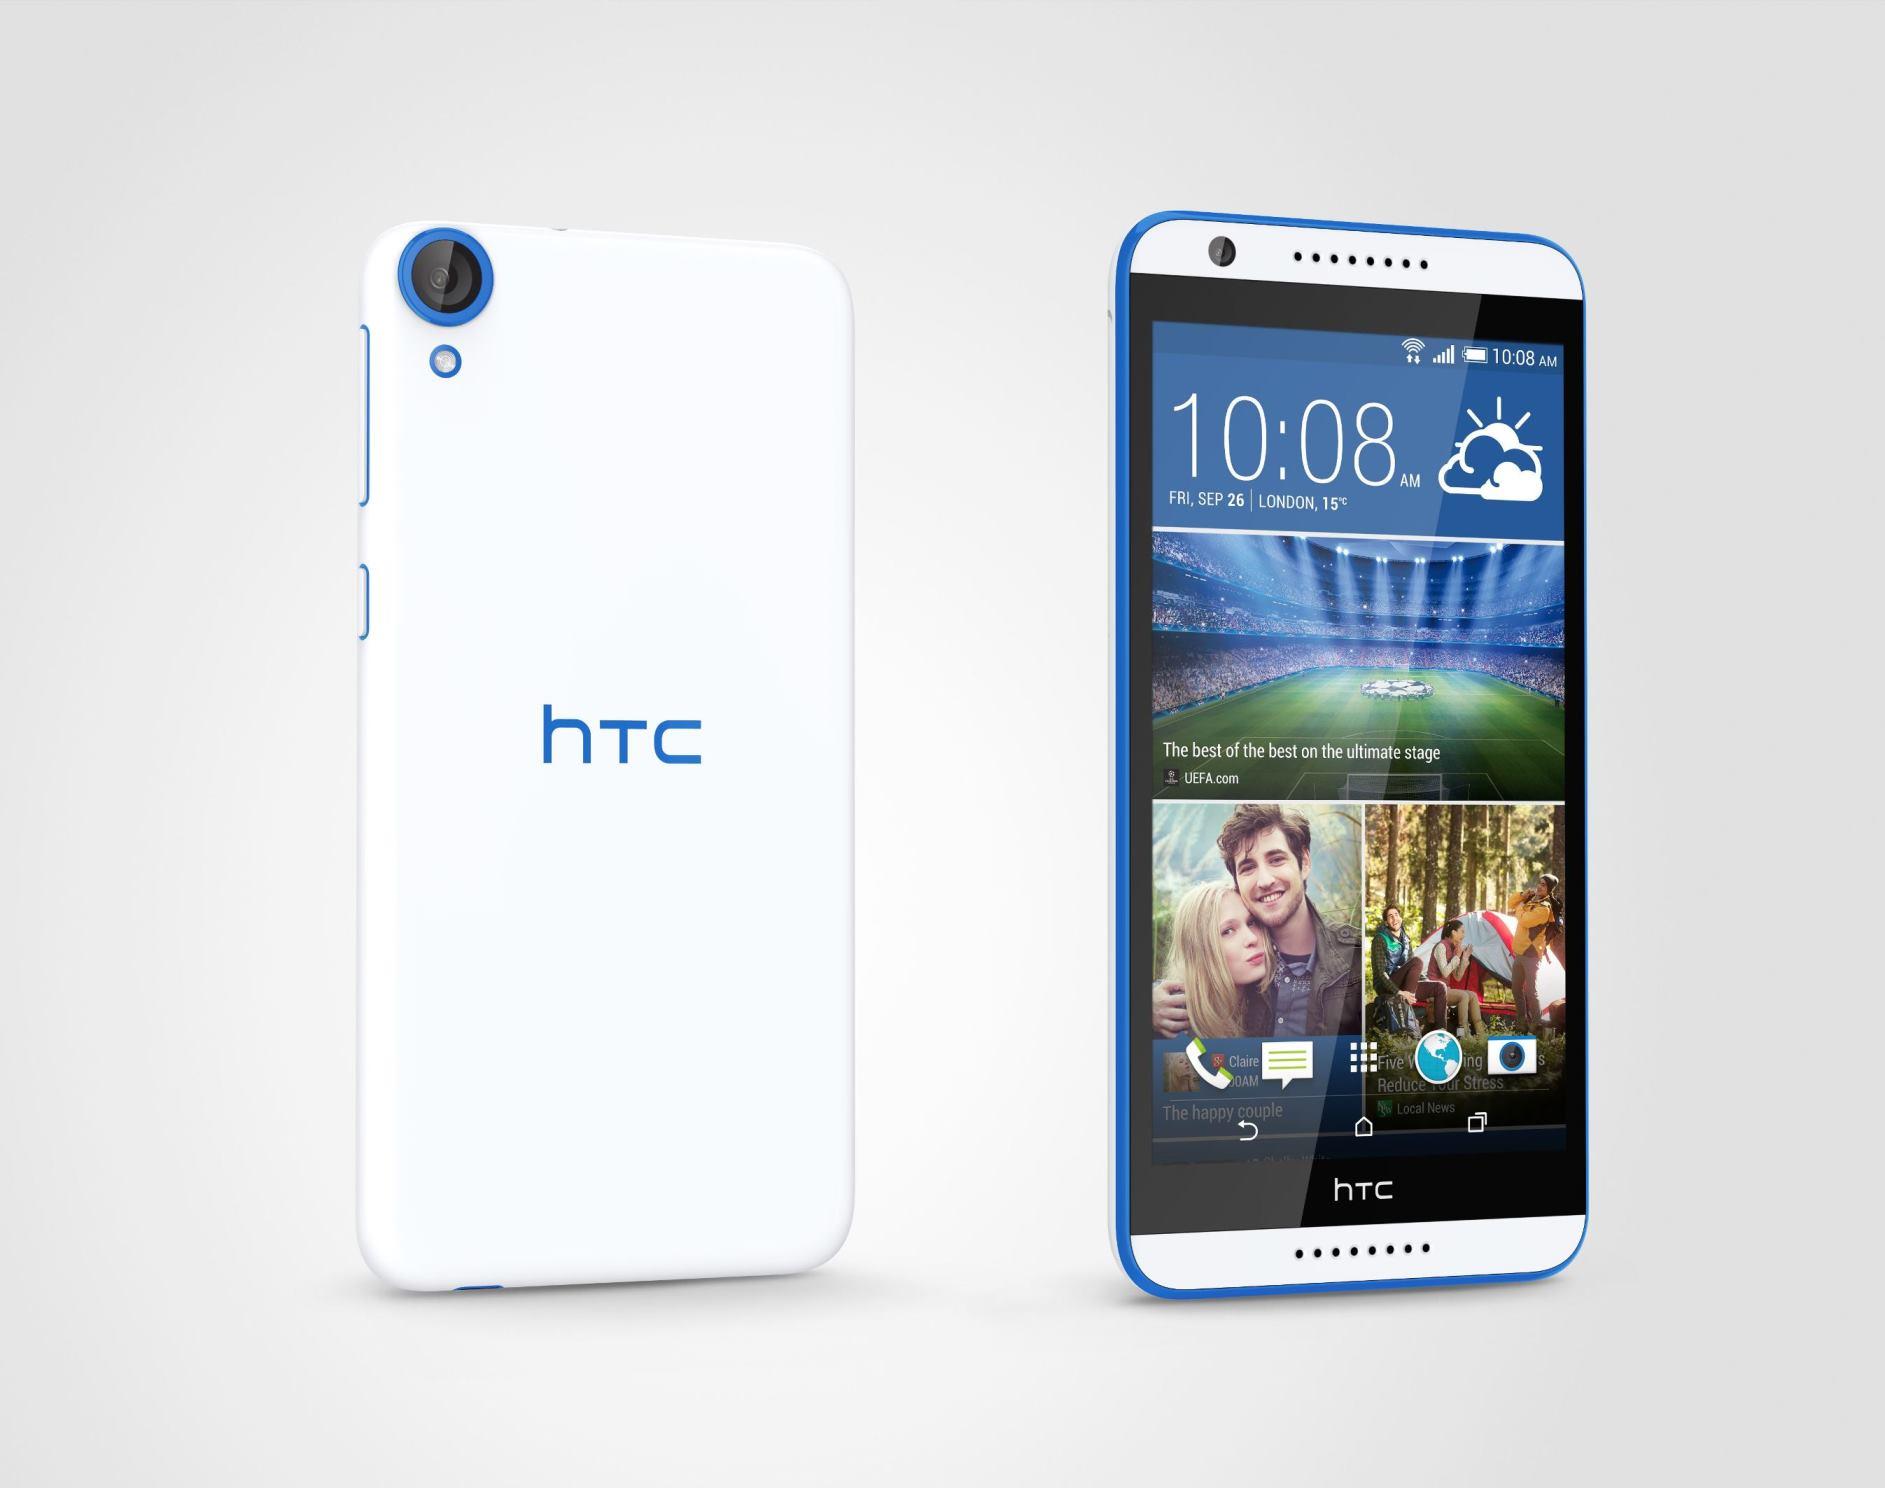 HTC Desire 820q Per right - HTC Desire 820q và HTC Desire 320 ra mắt tại Việt Nam